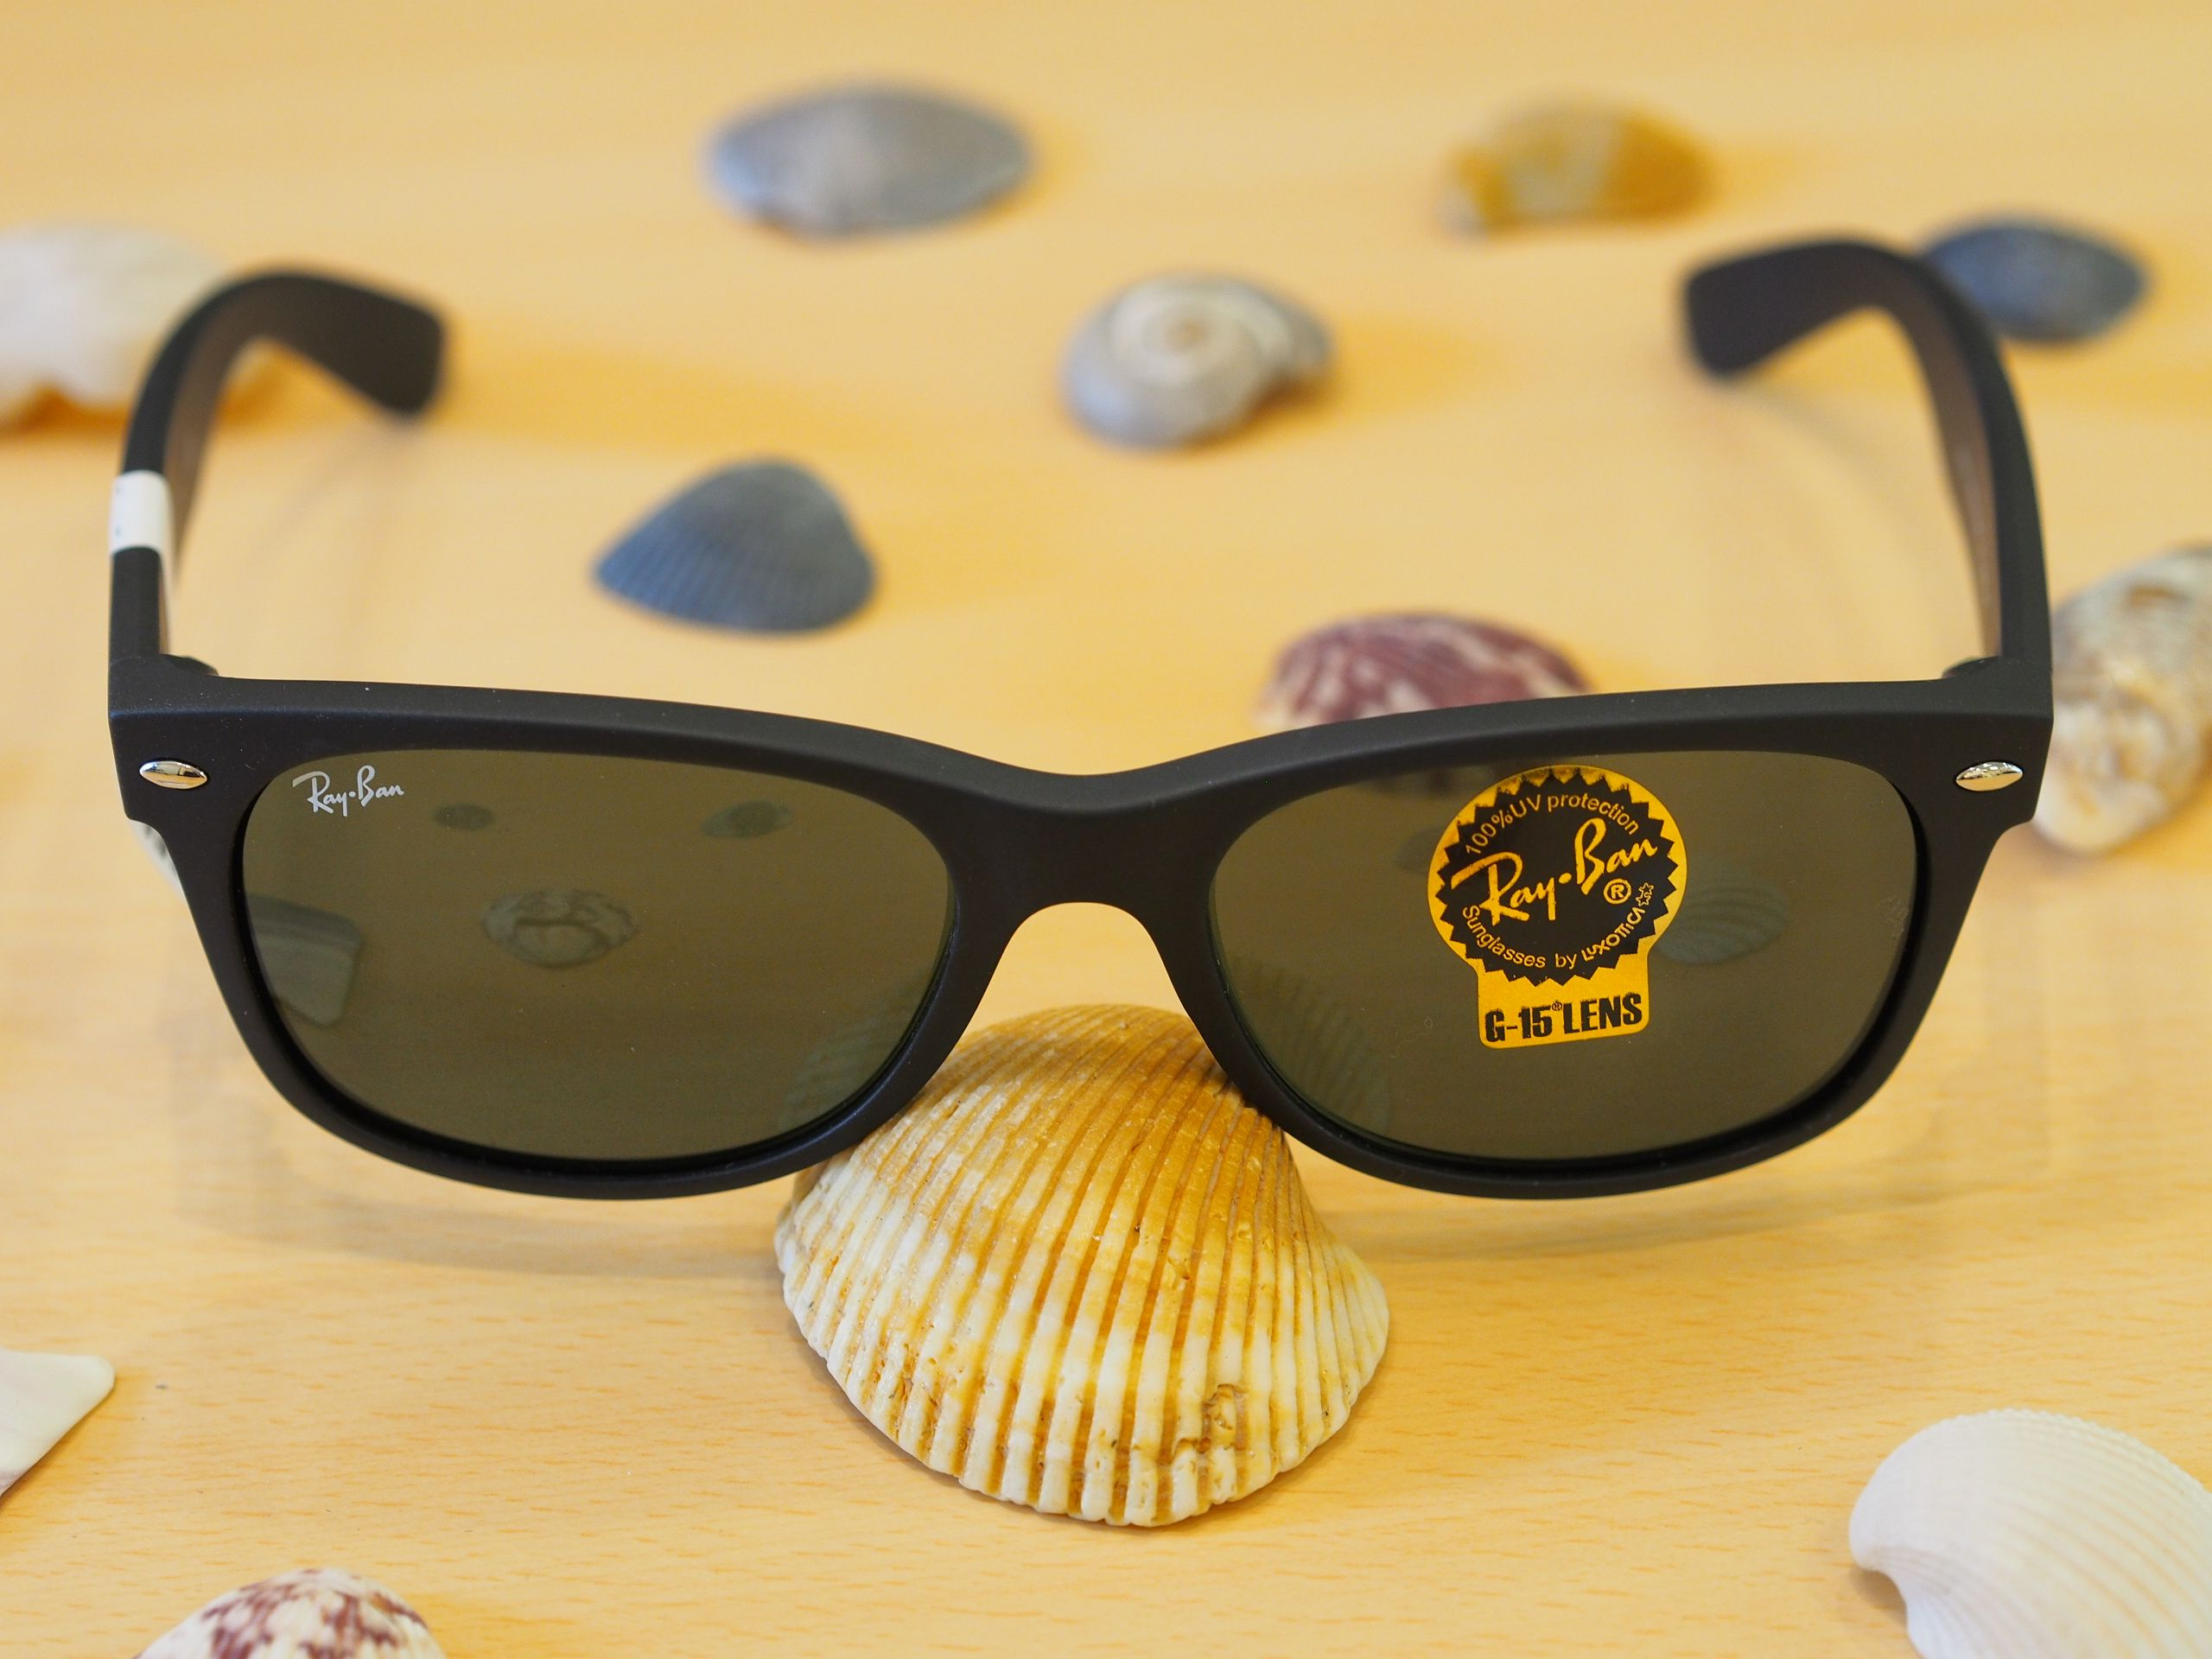 Rayban sunglasses 2014 sunglasses ray ban sunglasses